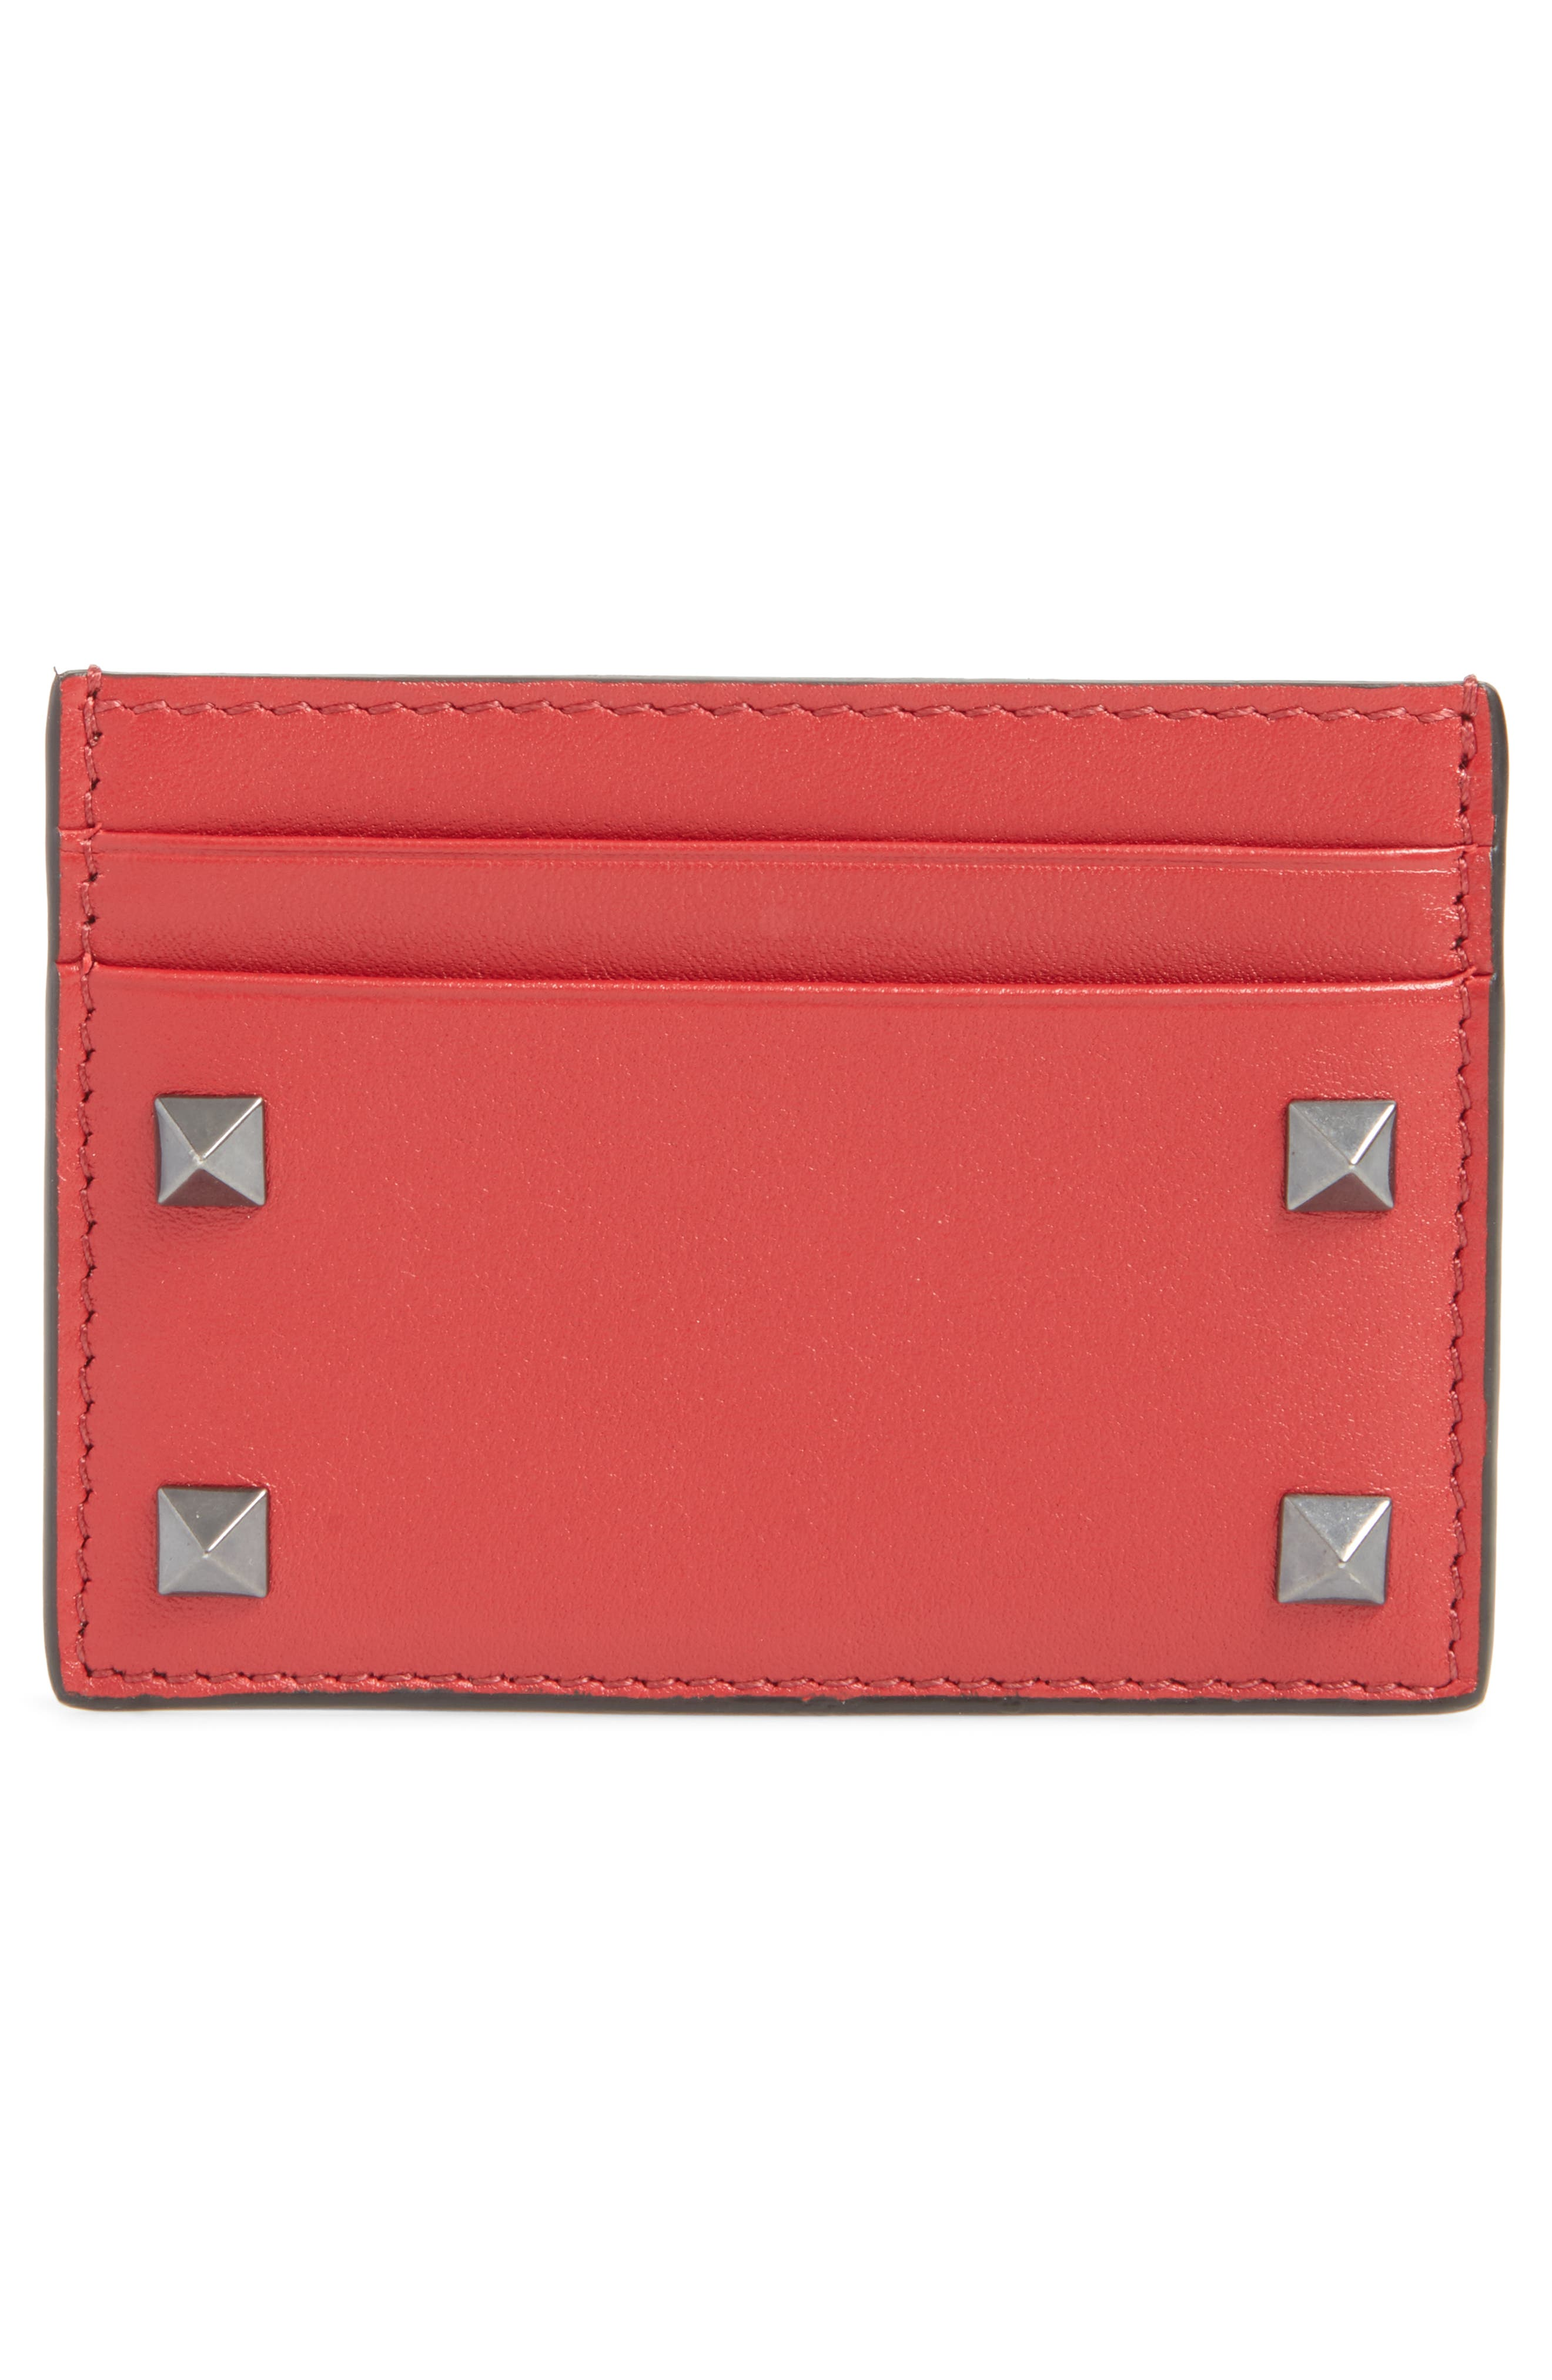 GARAVANI Stud Leather Card Case,                         Main,                         color, Red